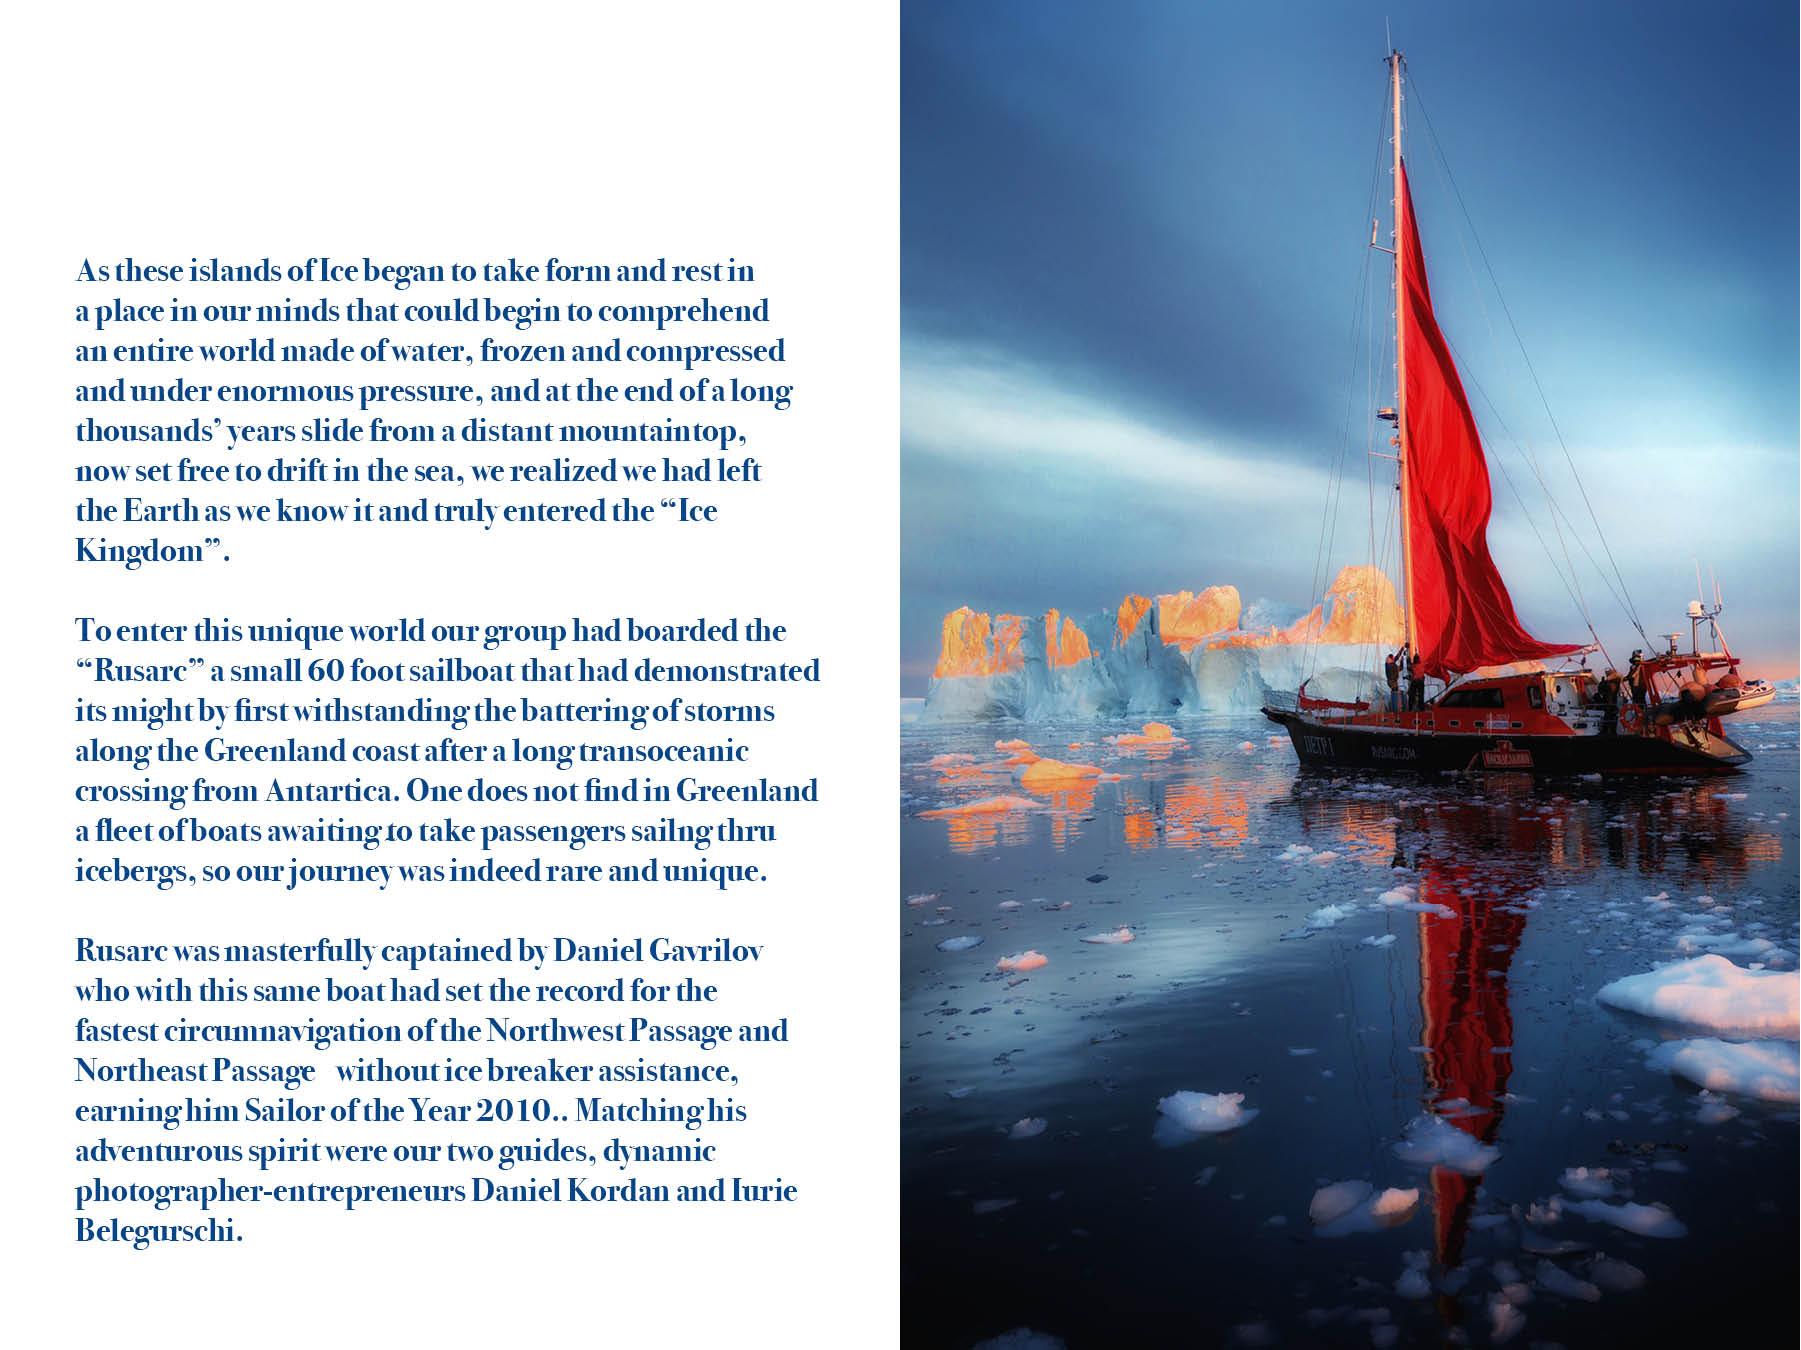 Sailing_Thru_Icebergs_article_4.jpg